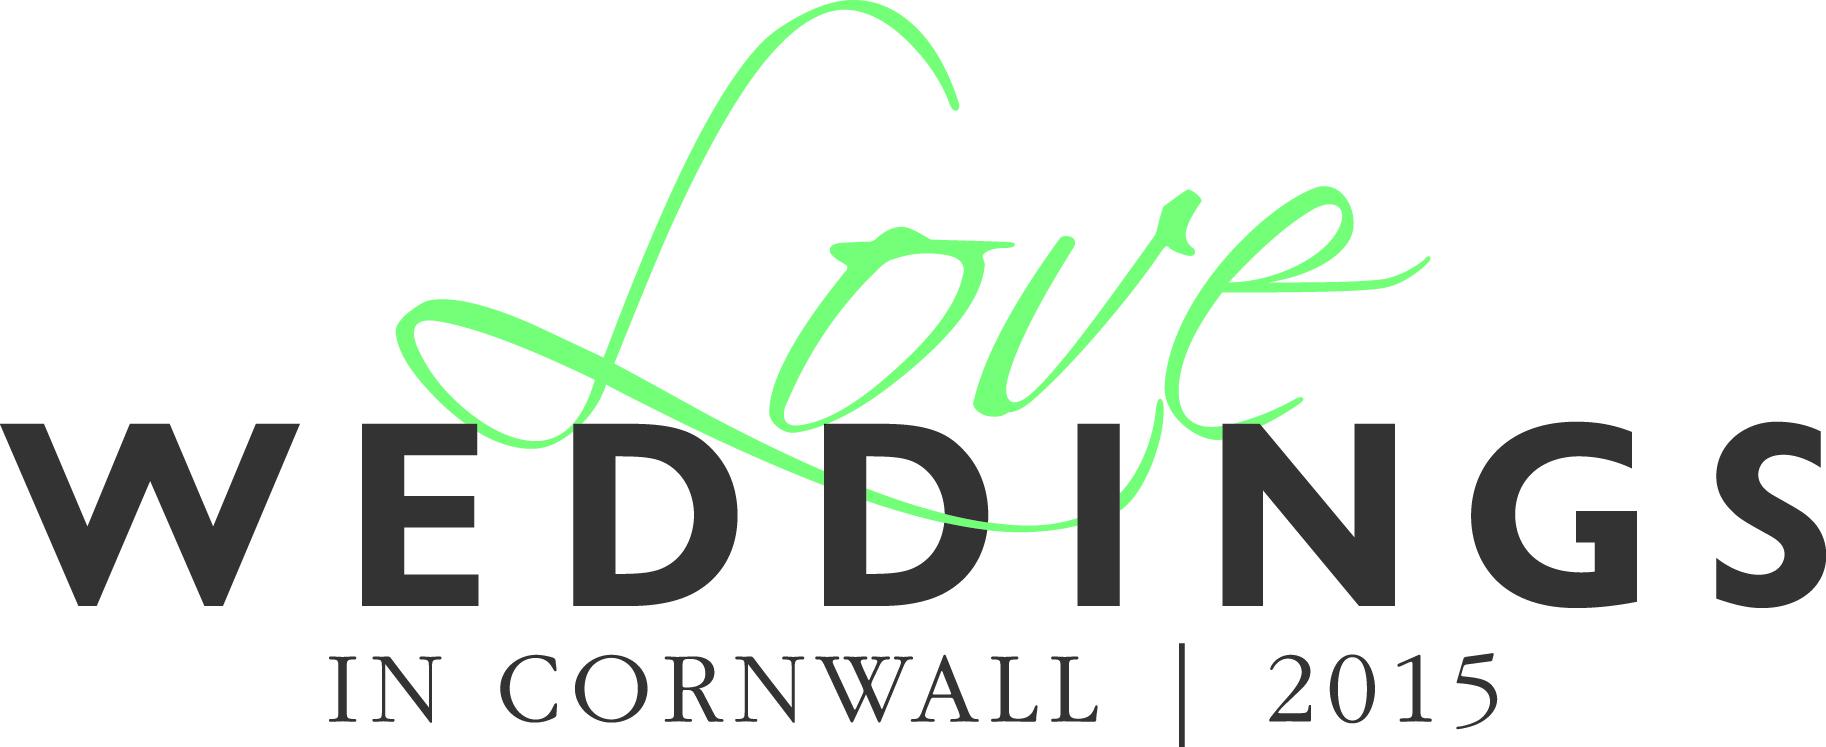 Love Weddings 2015_GREY GREEN NEW